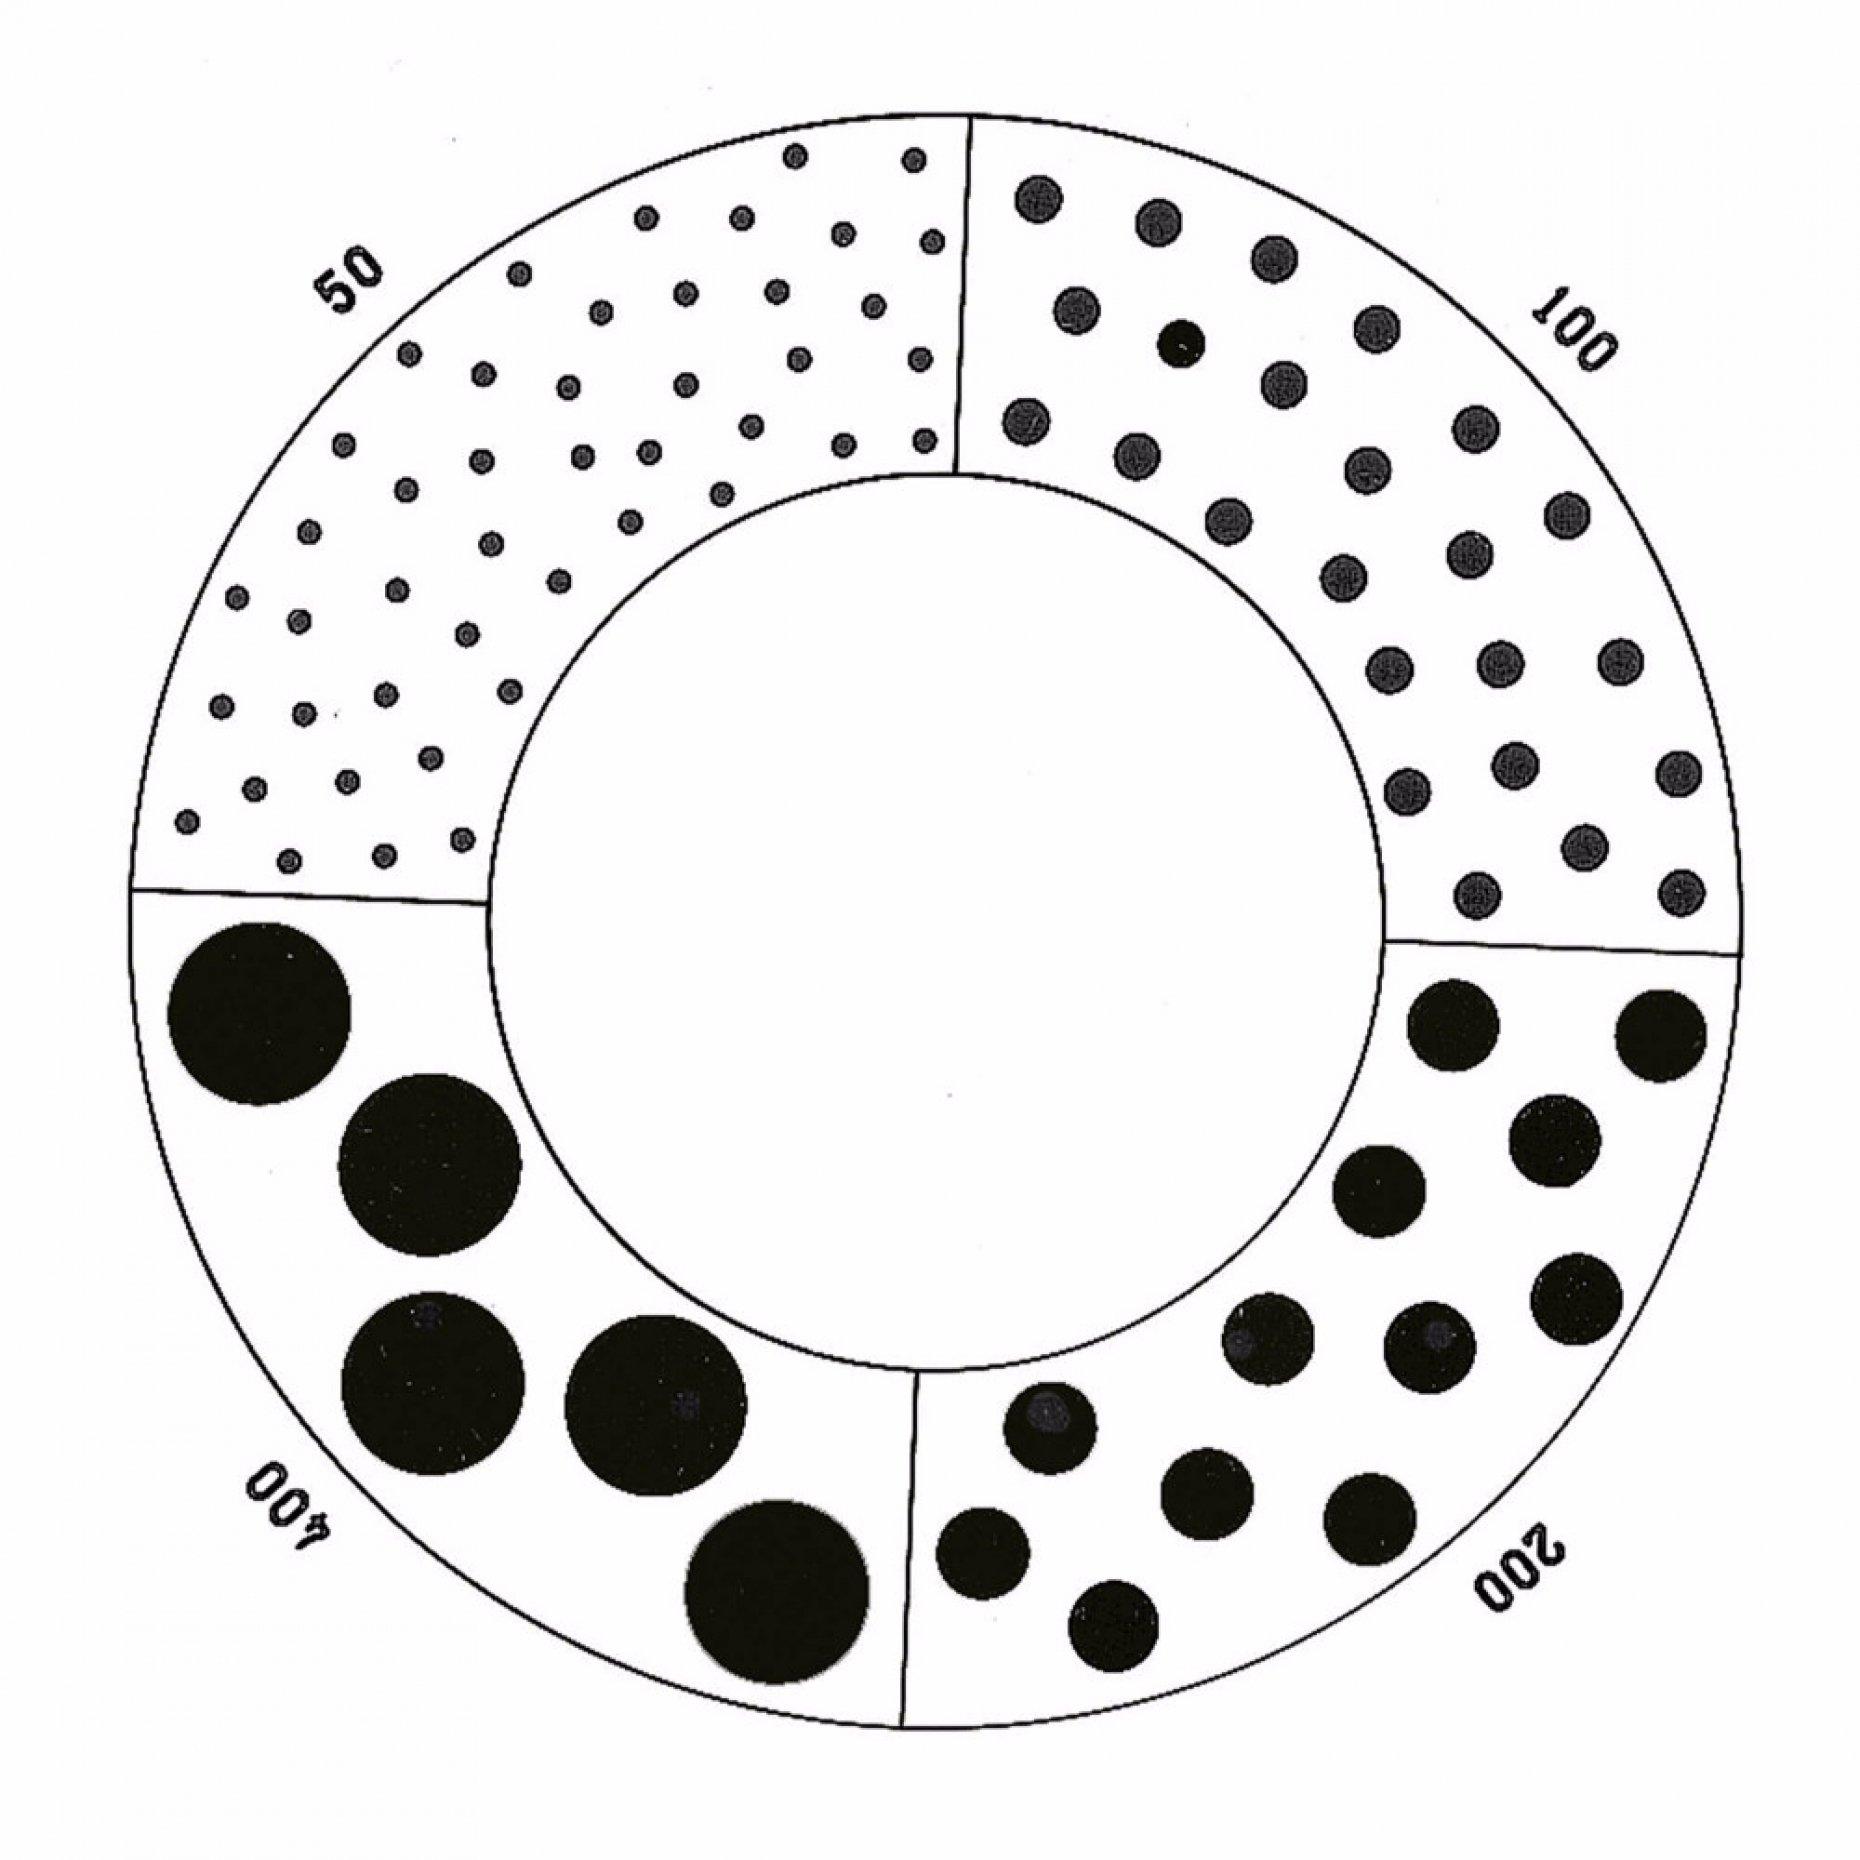 NG30 Matthews Spray Droplet Sizing Pattern